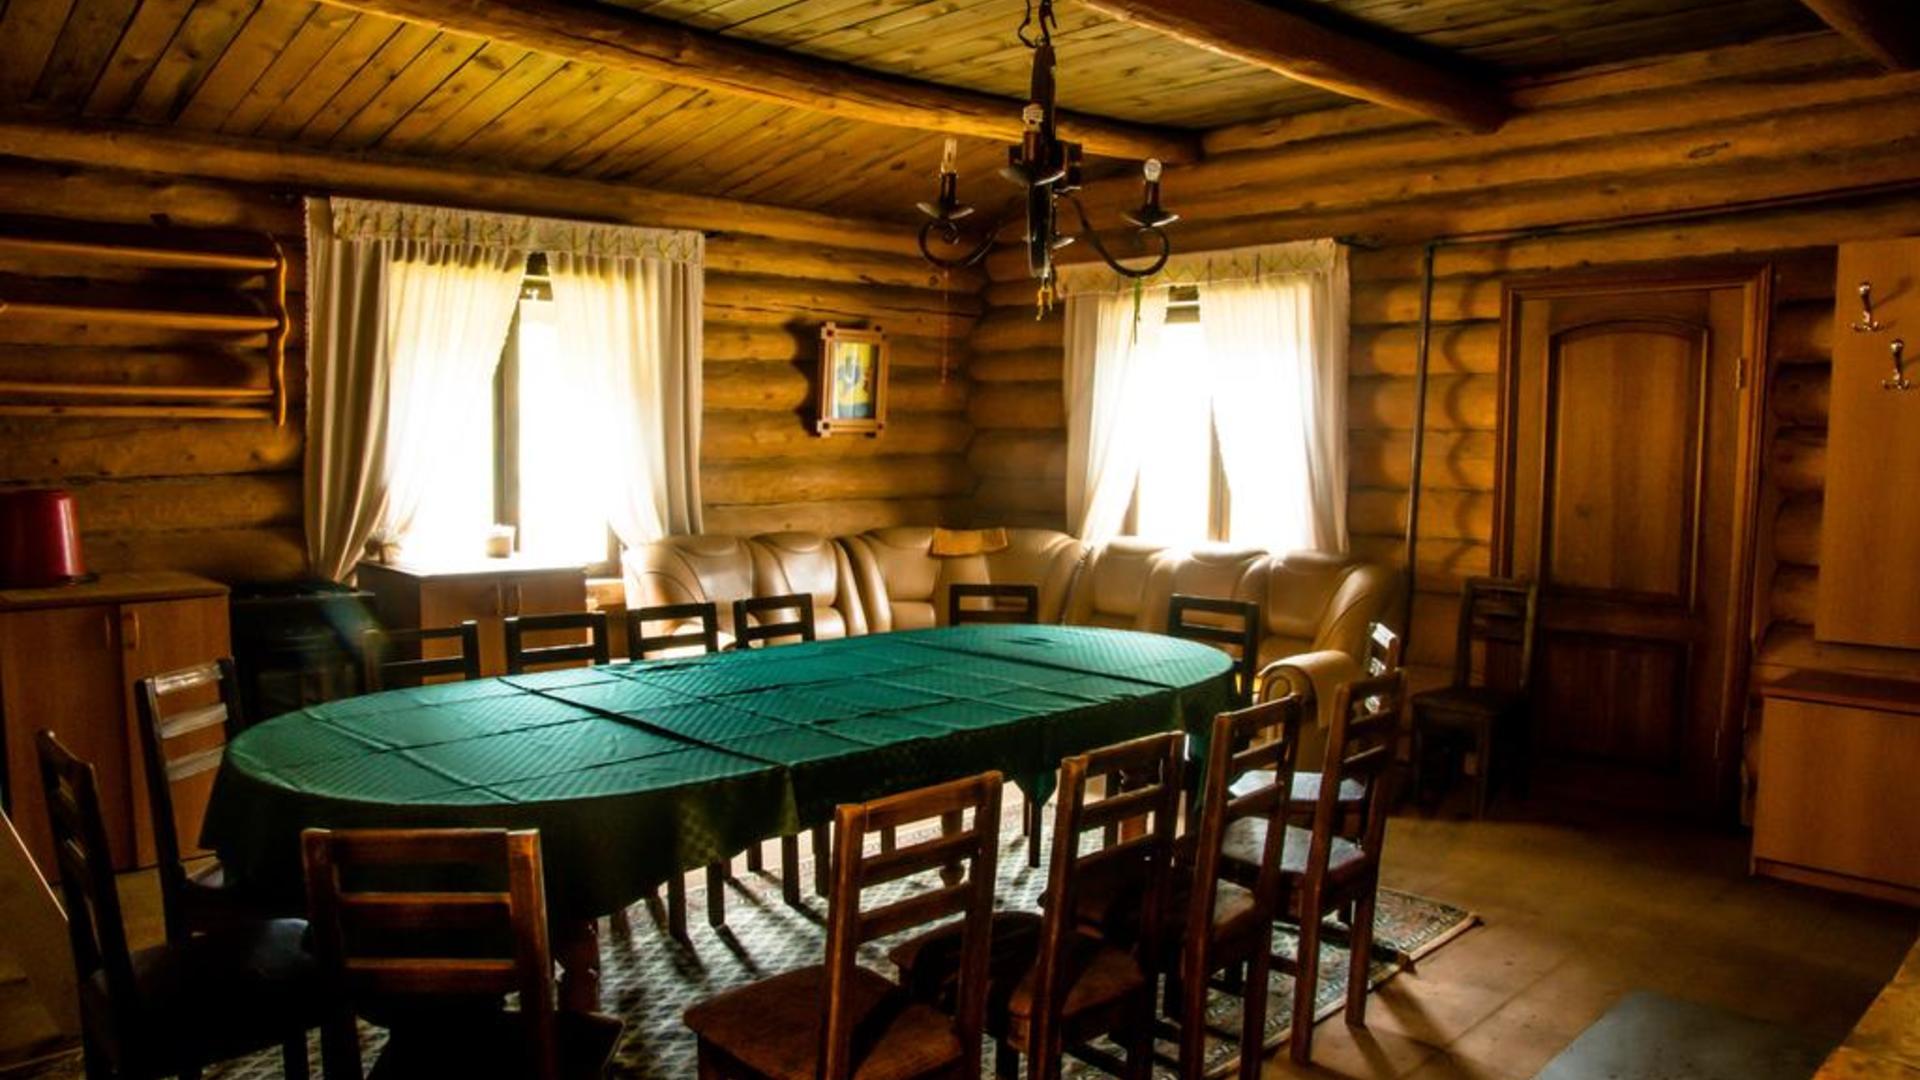 Гостиница лесная заимка барнаул фото